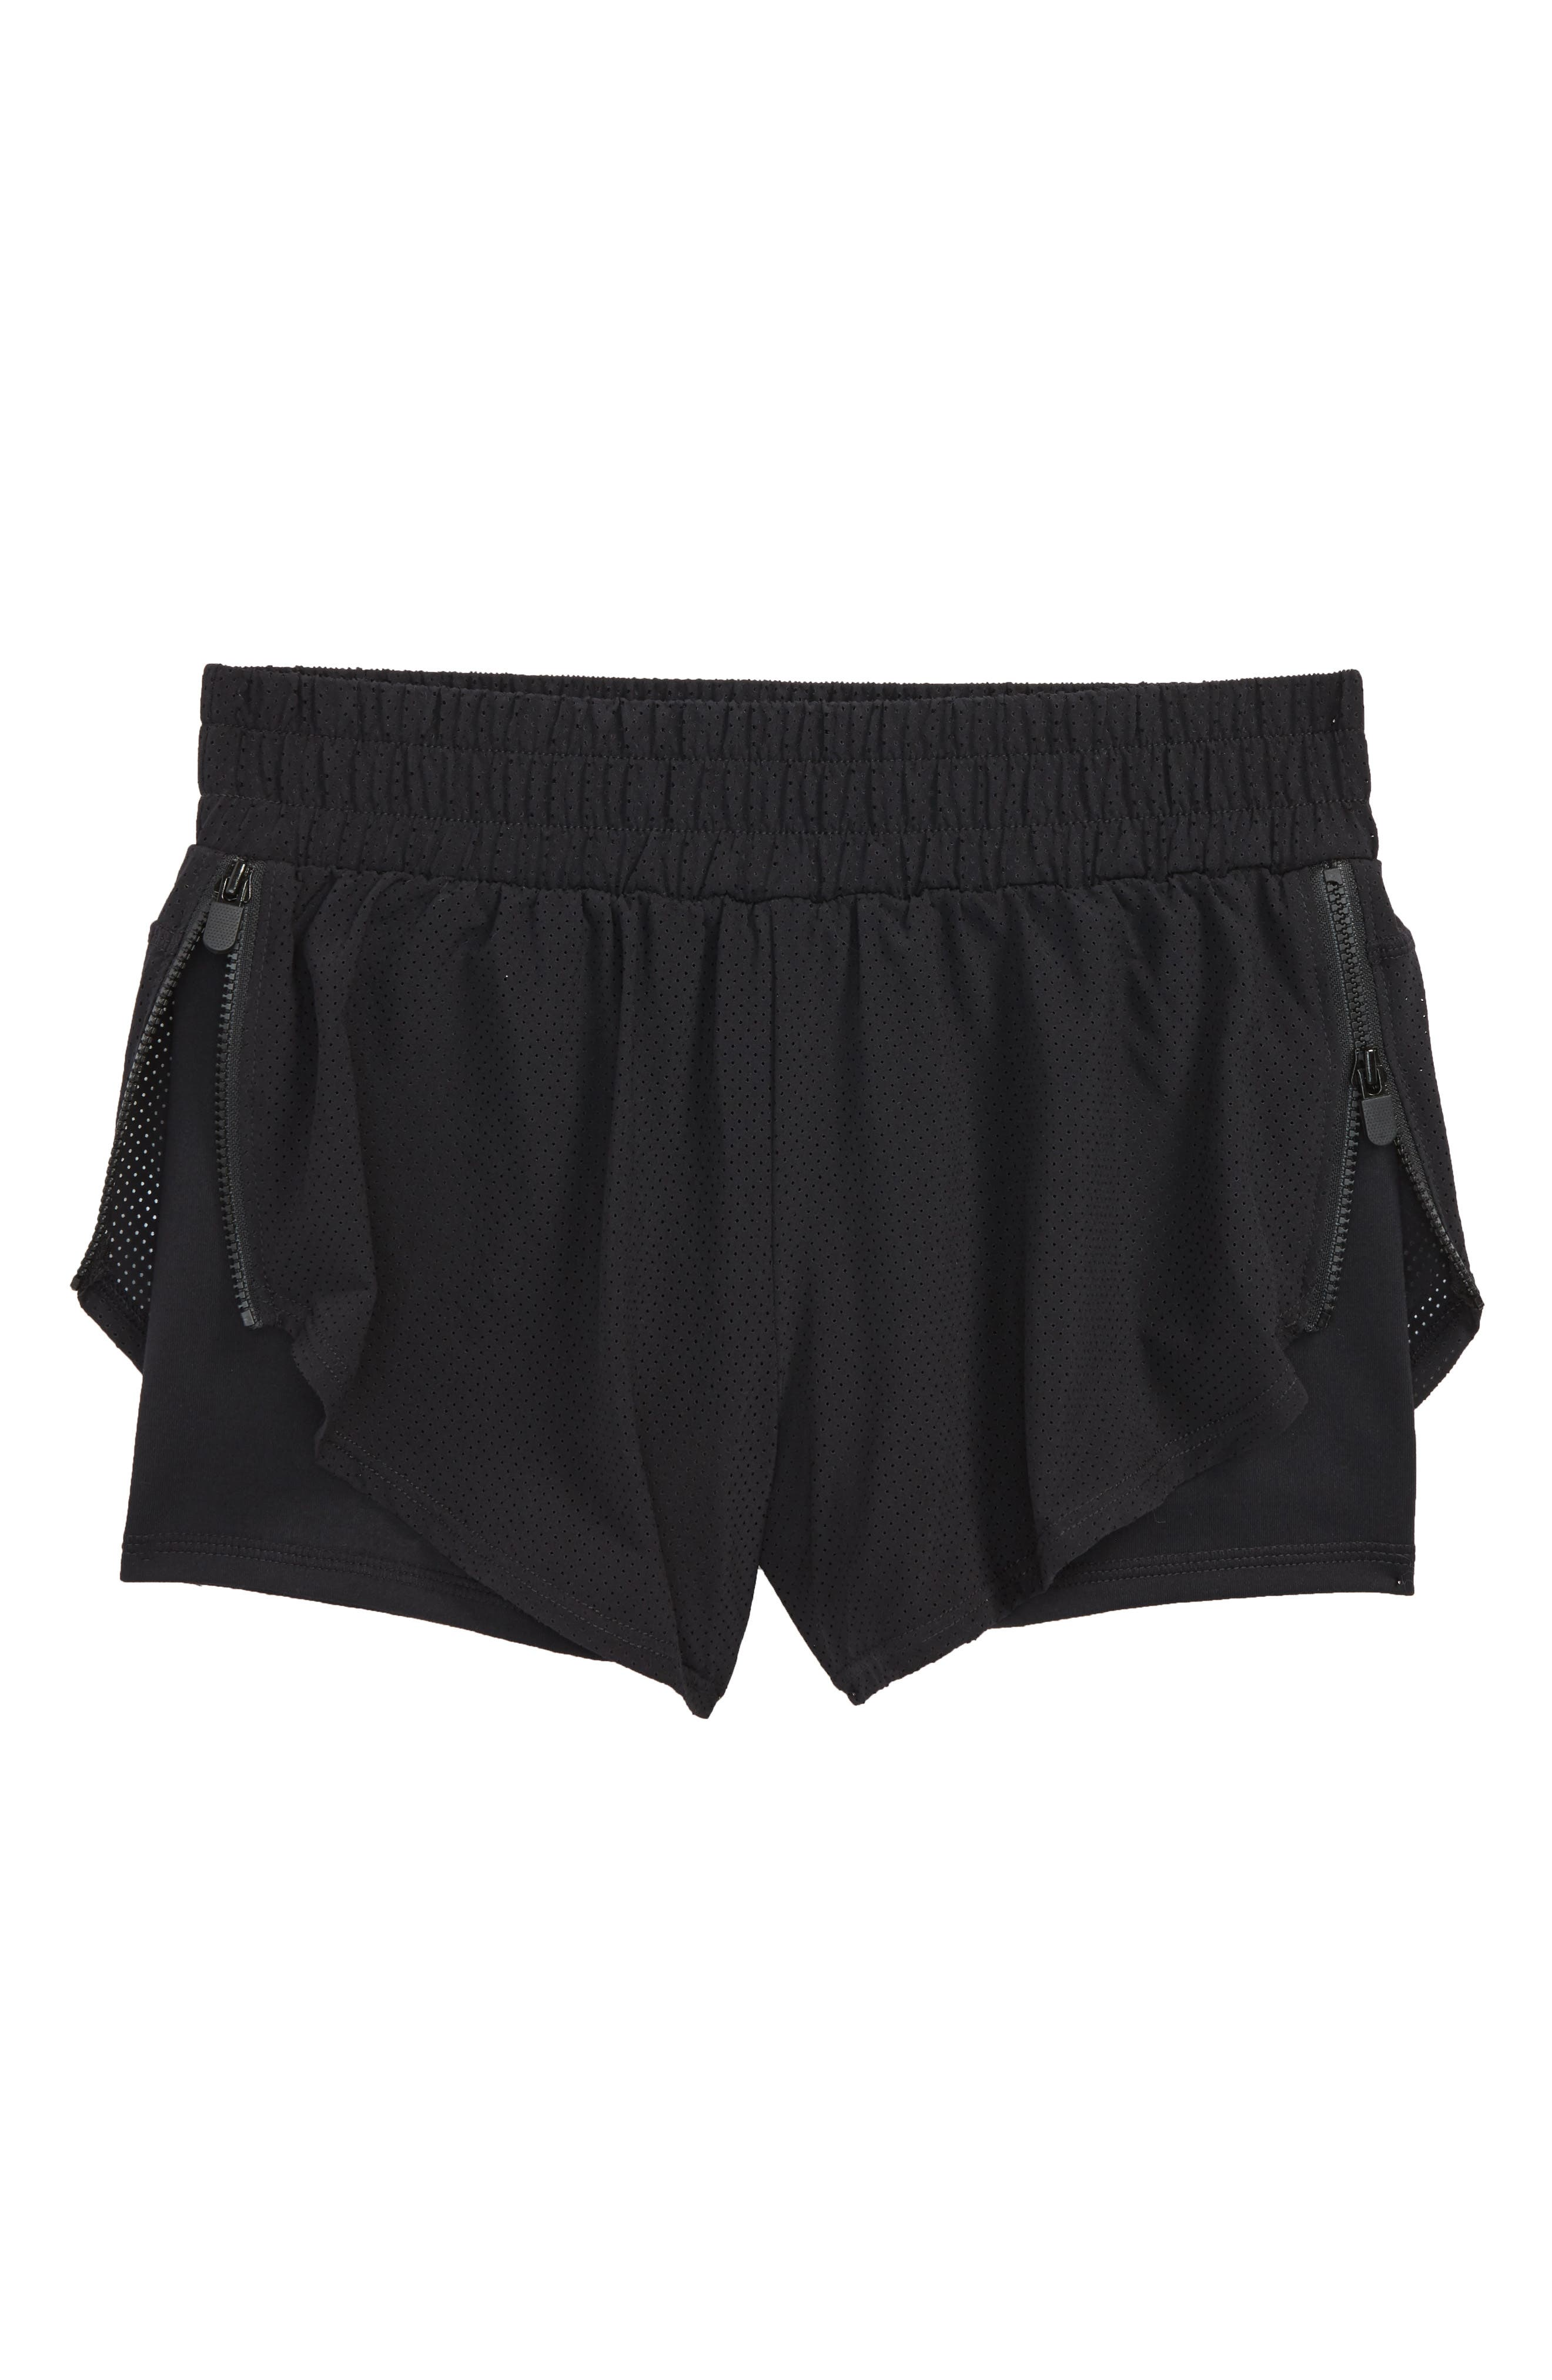 Double Layer Shorts,                             Main thumbnail 1, color,                             001